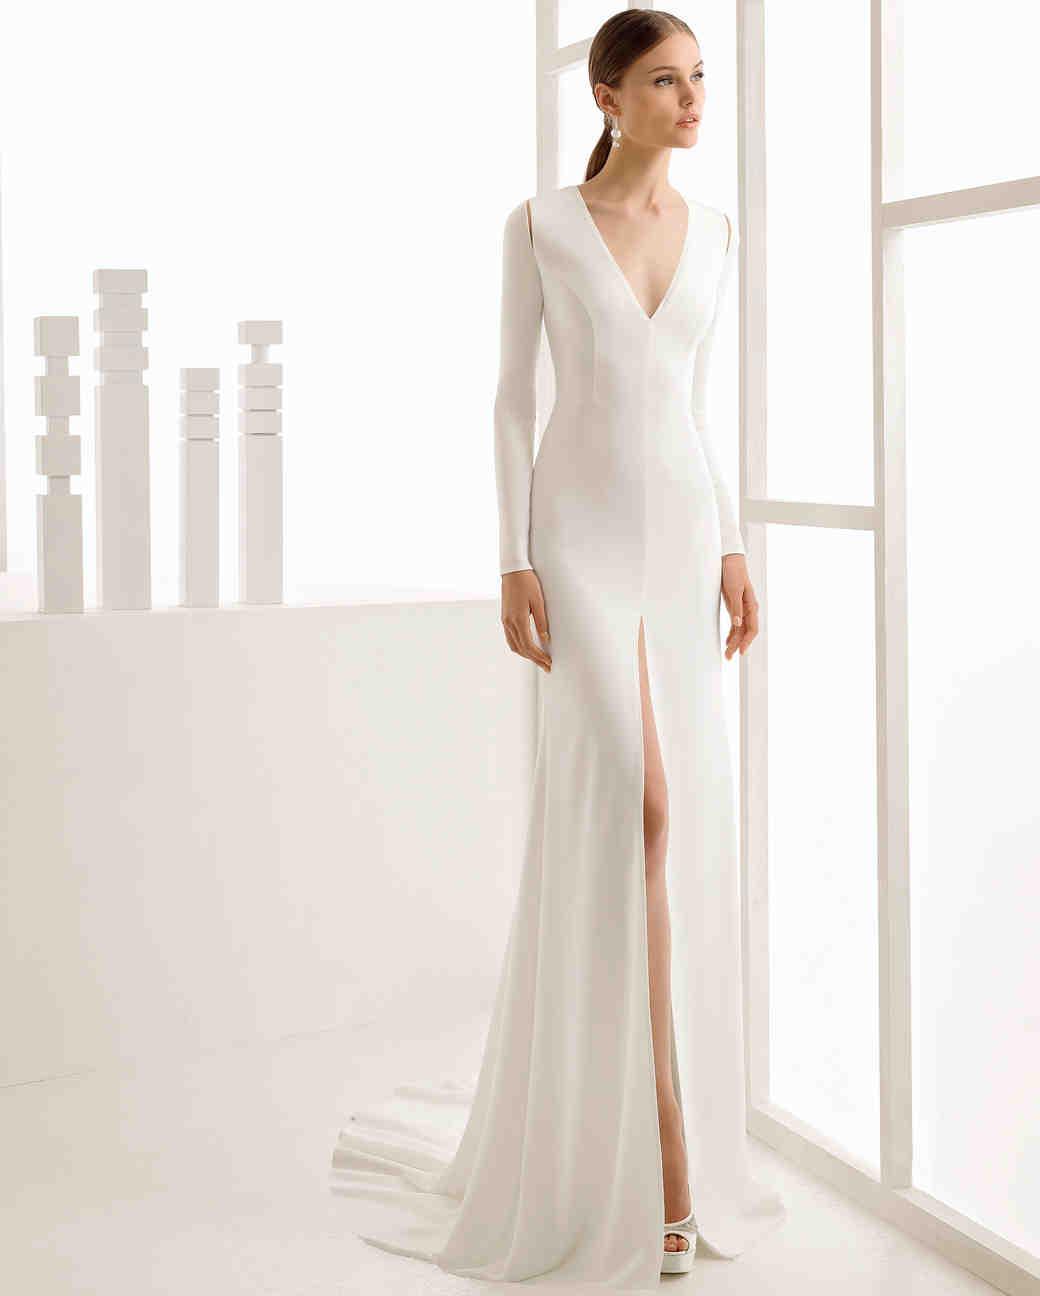 530af3a8a9 Rosa Clará Fall 2017 Wedding Dress Collection